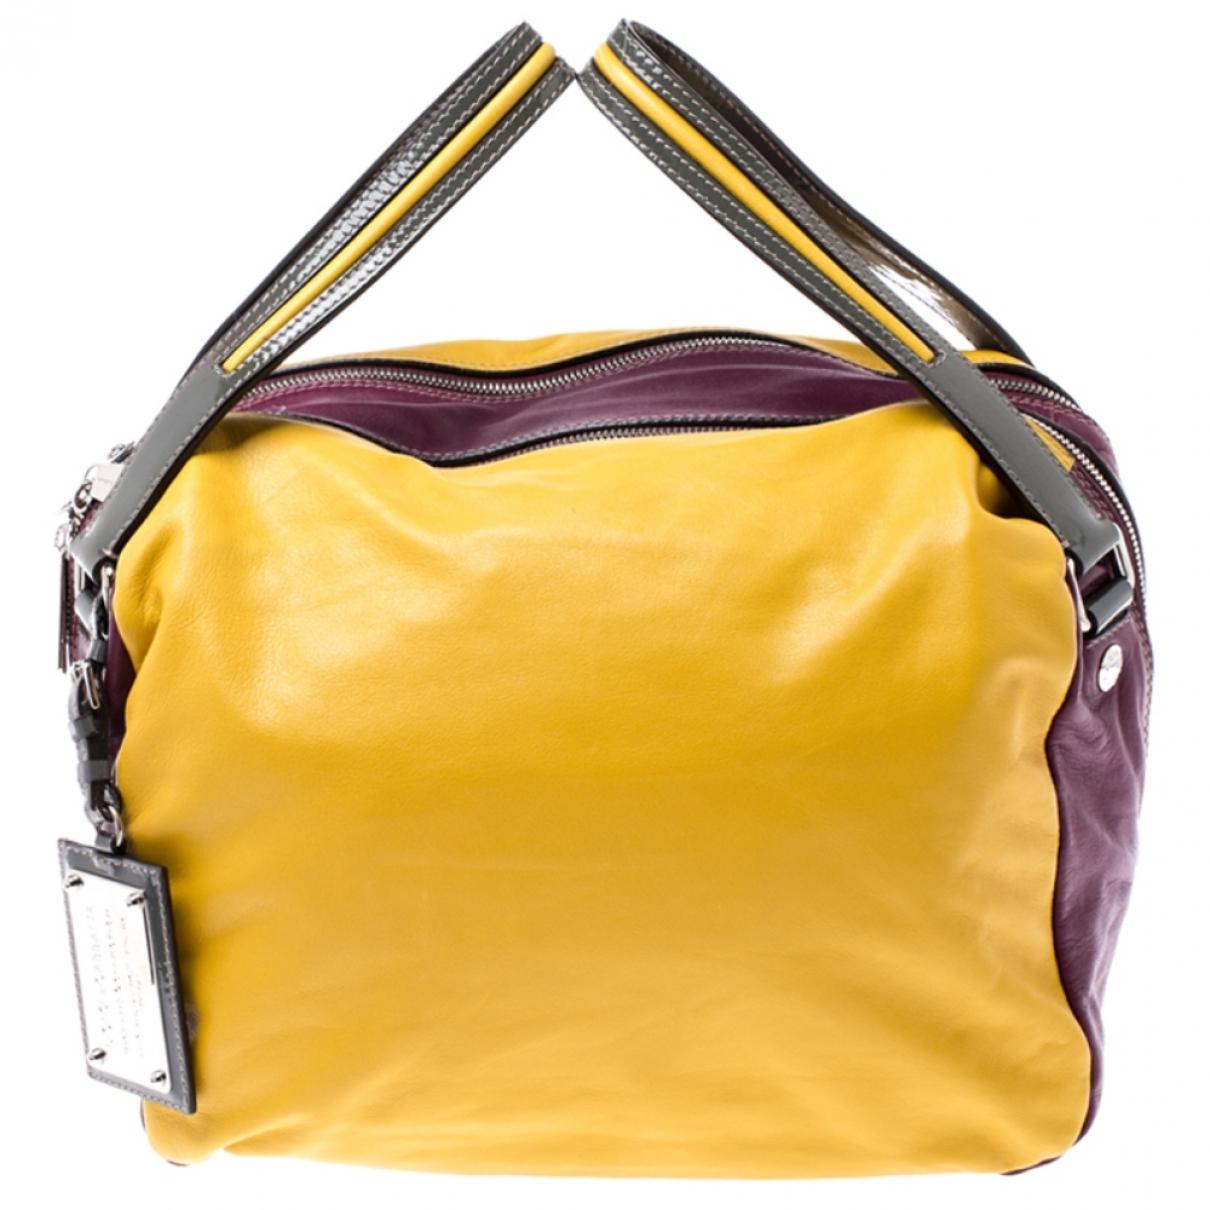 Dolce & Gabbana \N Multicolour Leather handbag for Women \N